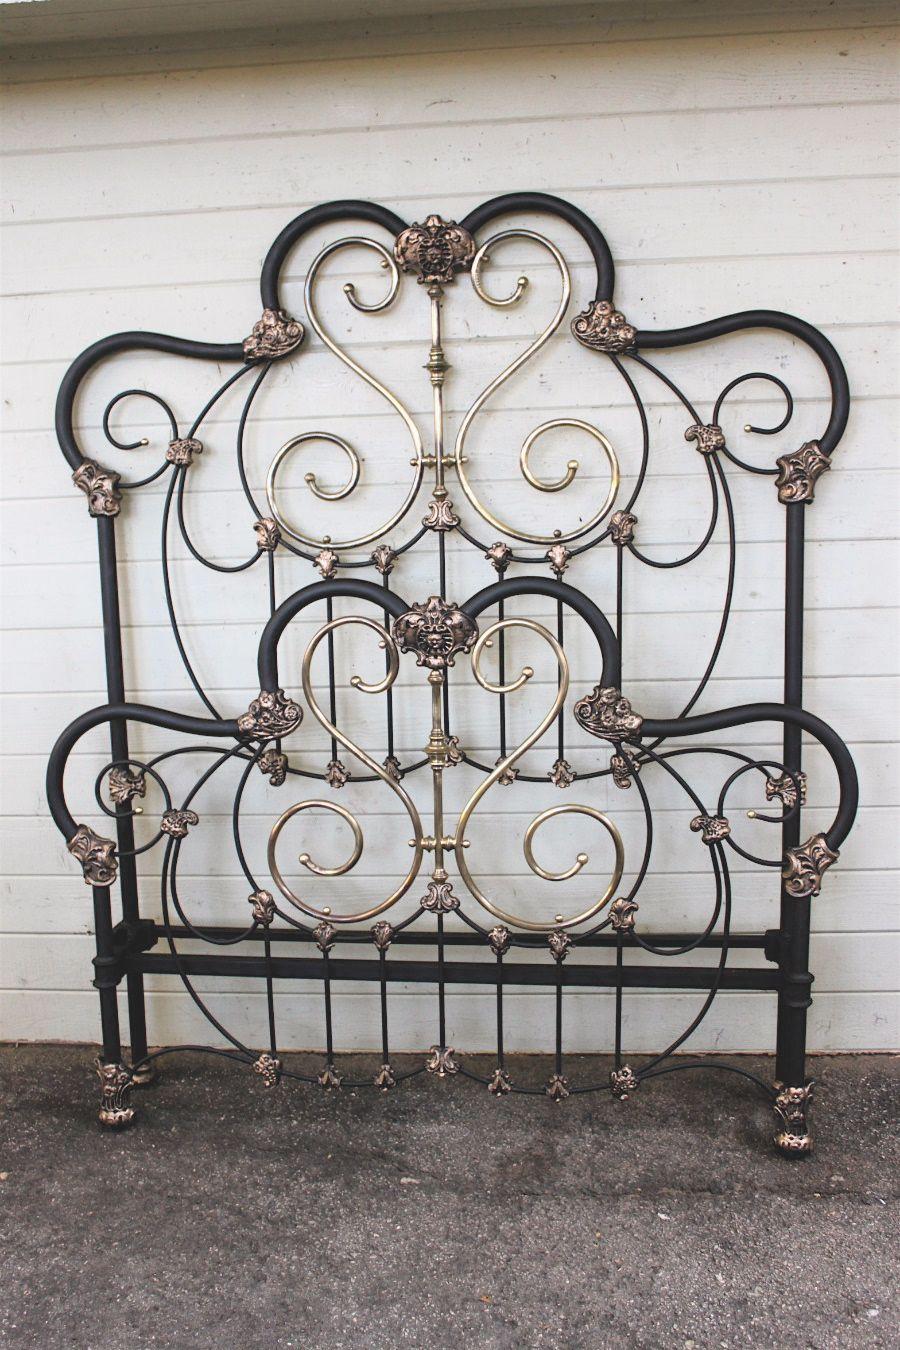 wrought iron headboard and footboard on antique iron bed 7 iron headboard iron bed frame antique iron beds iron headboard iron bed frame